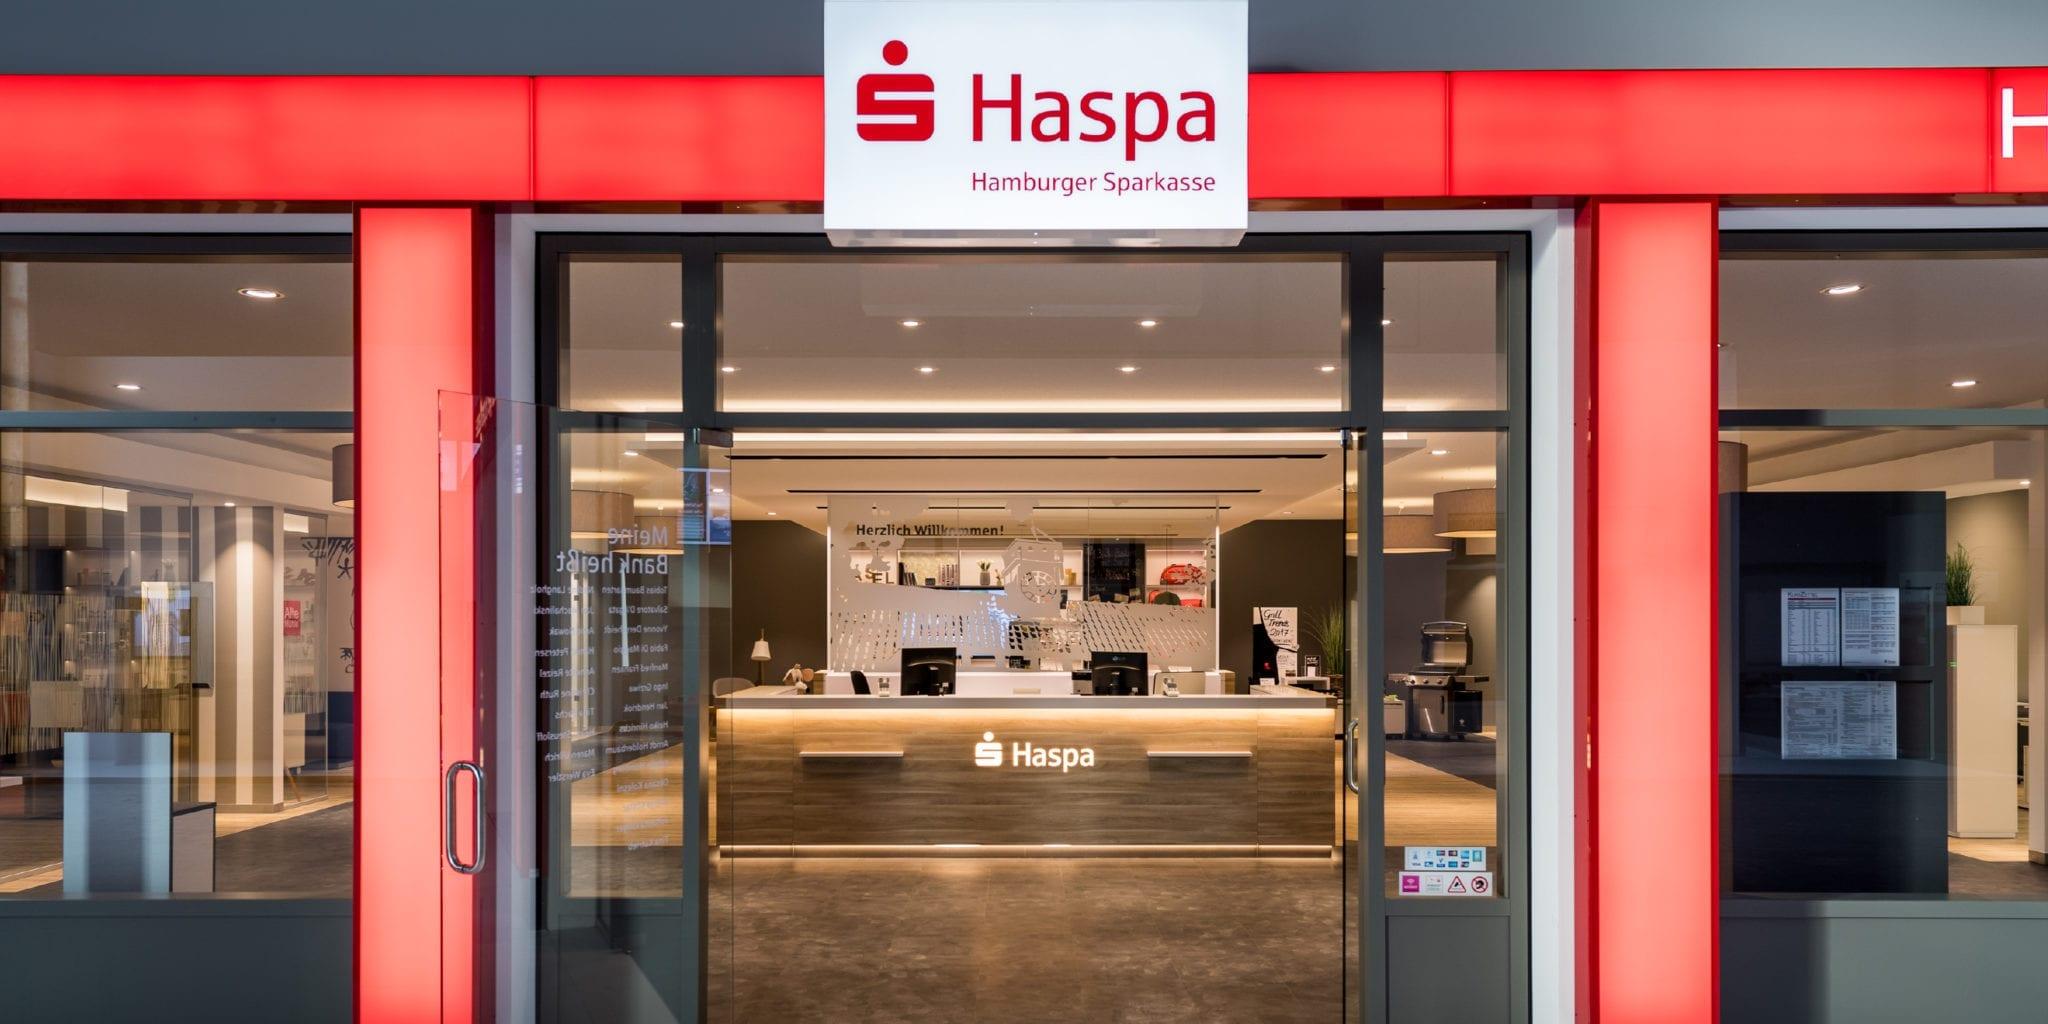 Haspa branch of the future facade